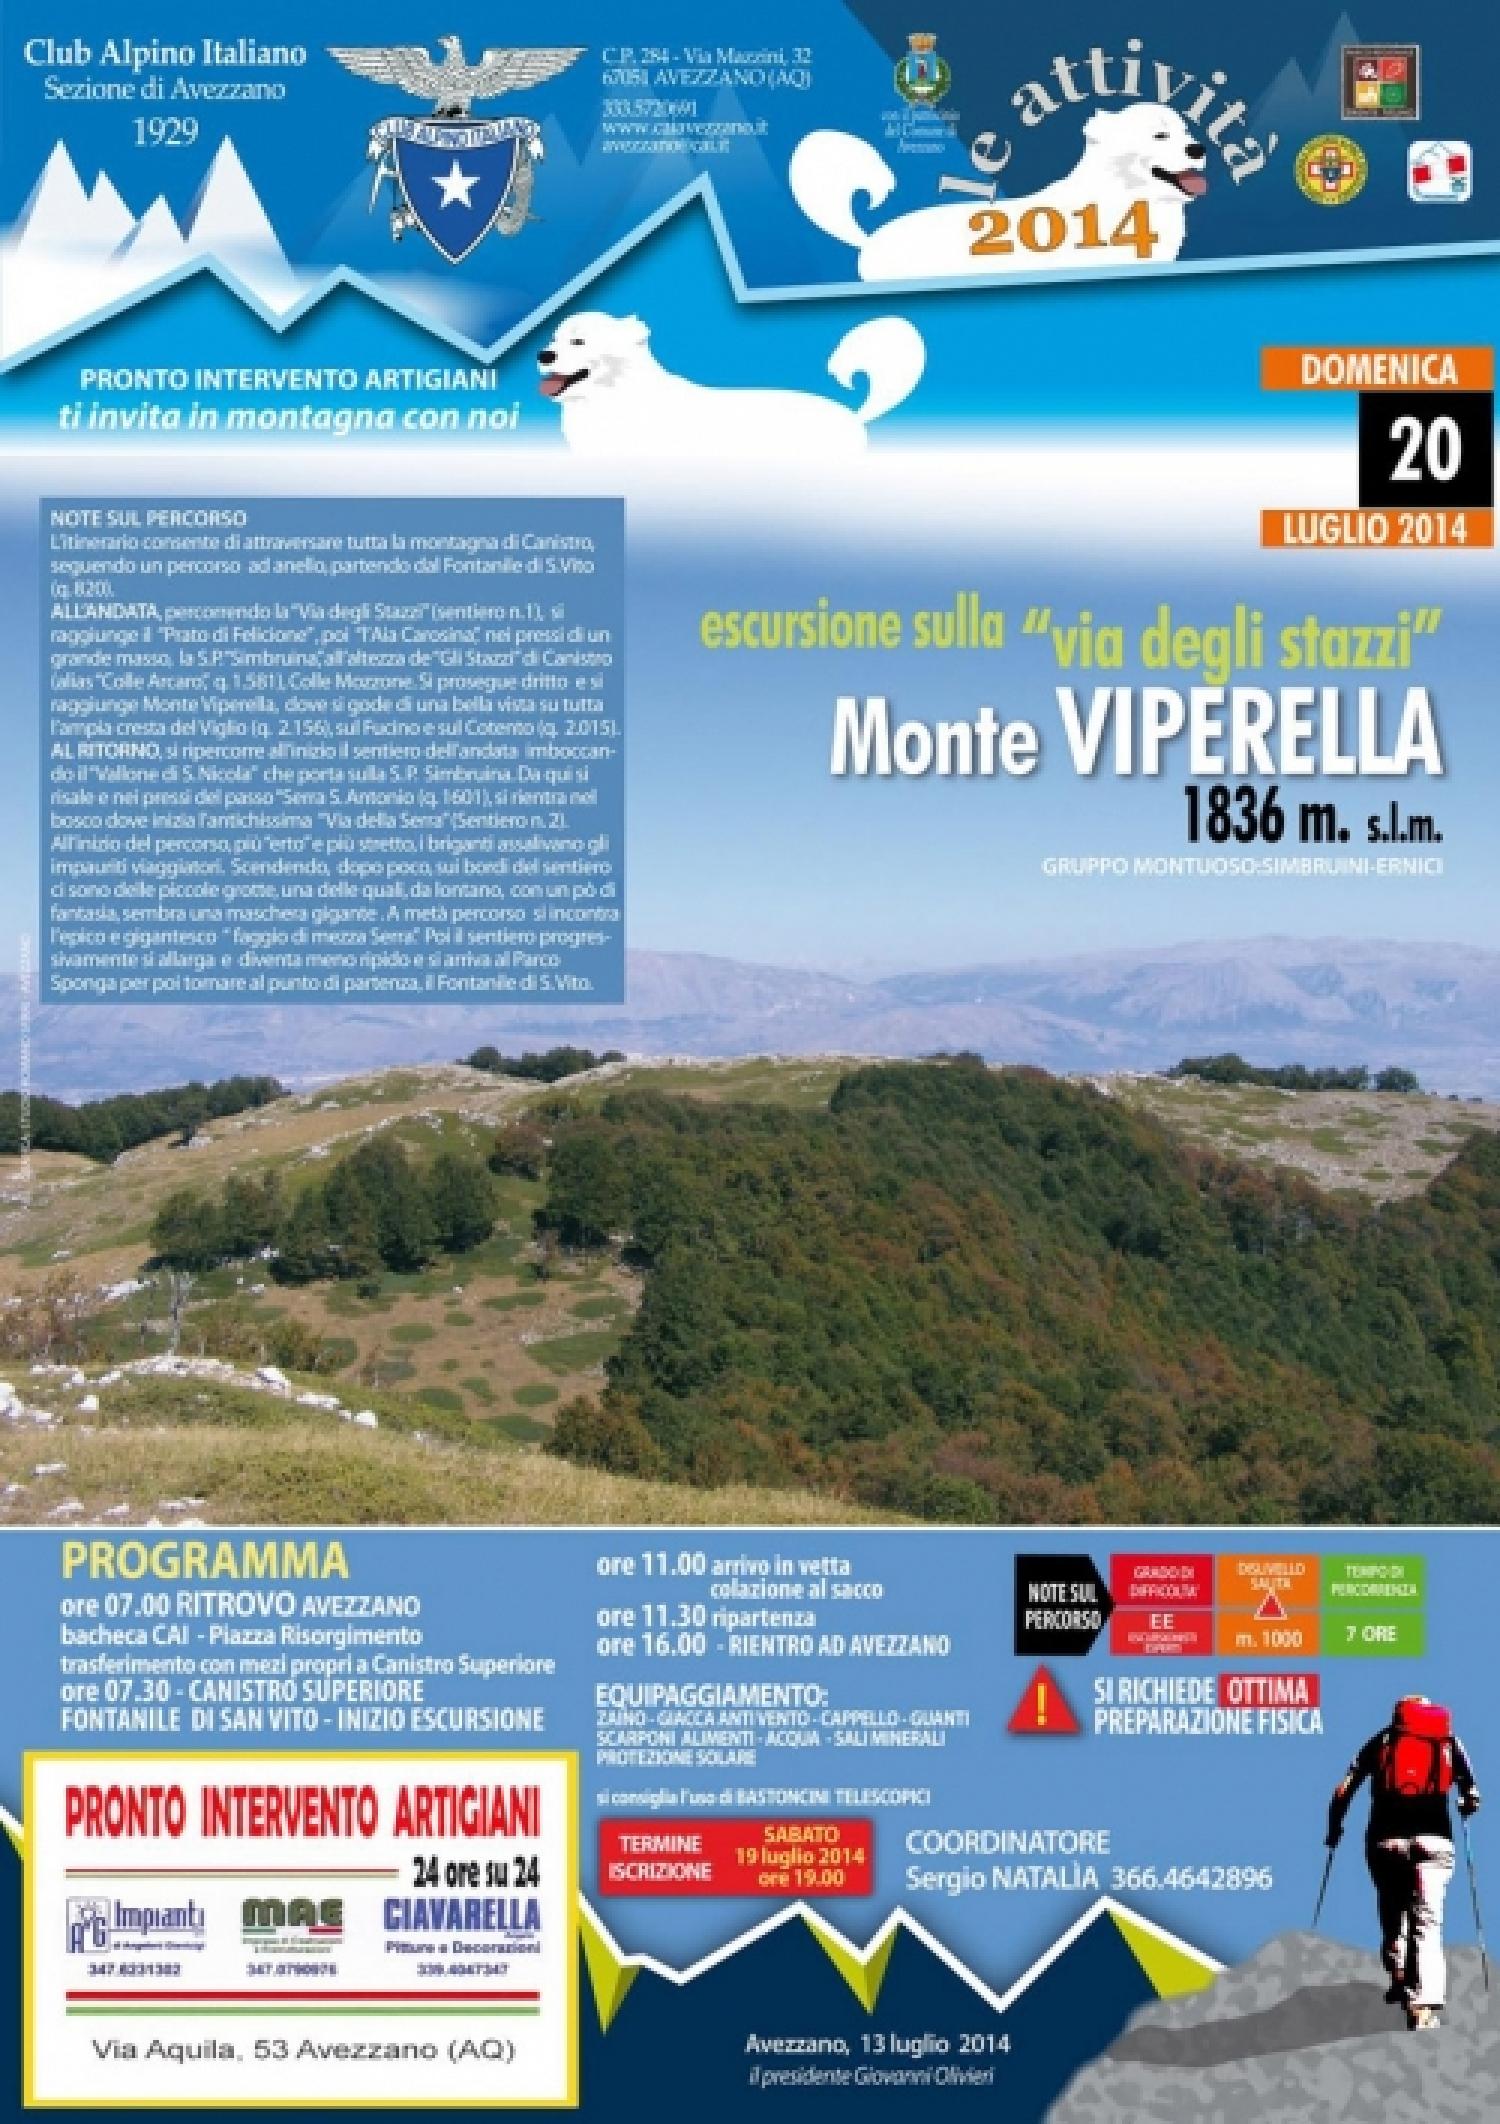 LOCANDINA MONTE VIPERELLA 20 LUG. 2014.jpg